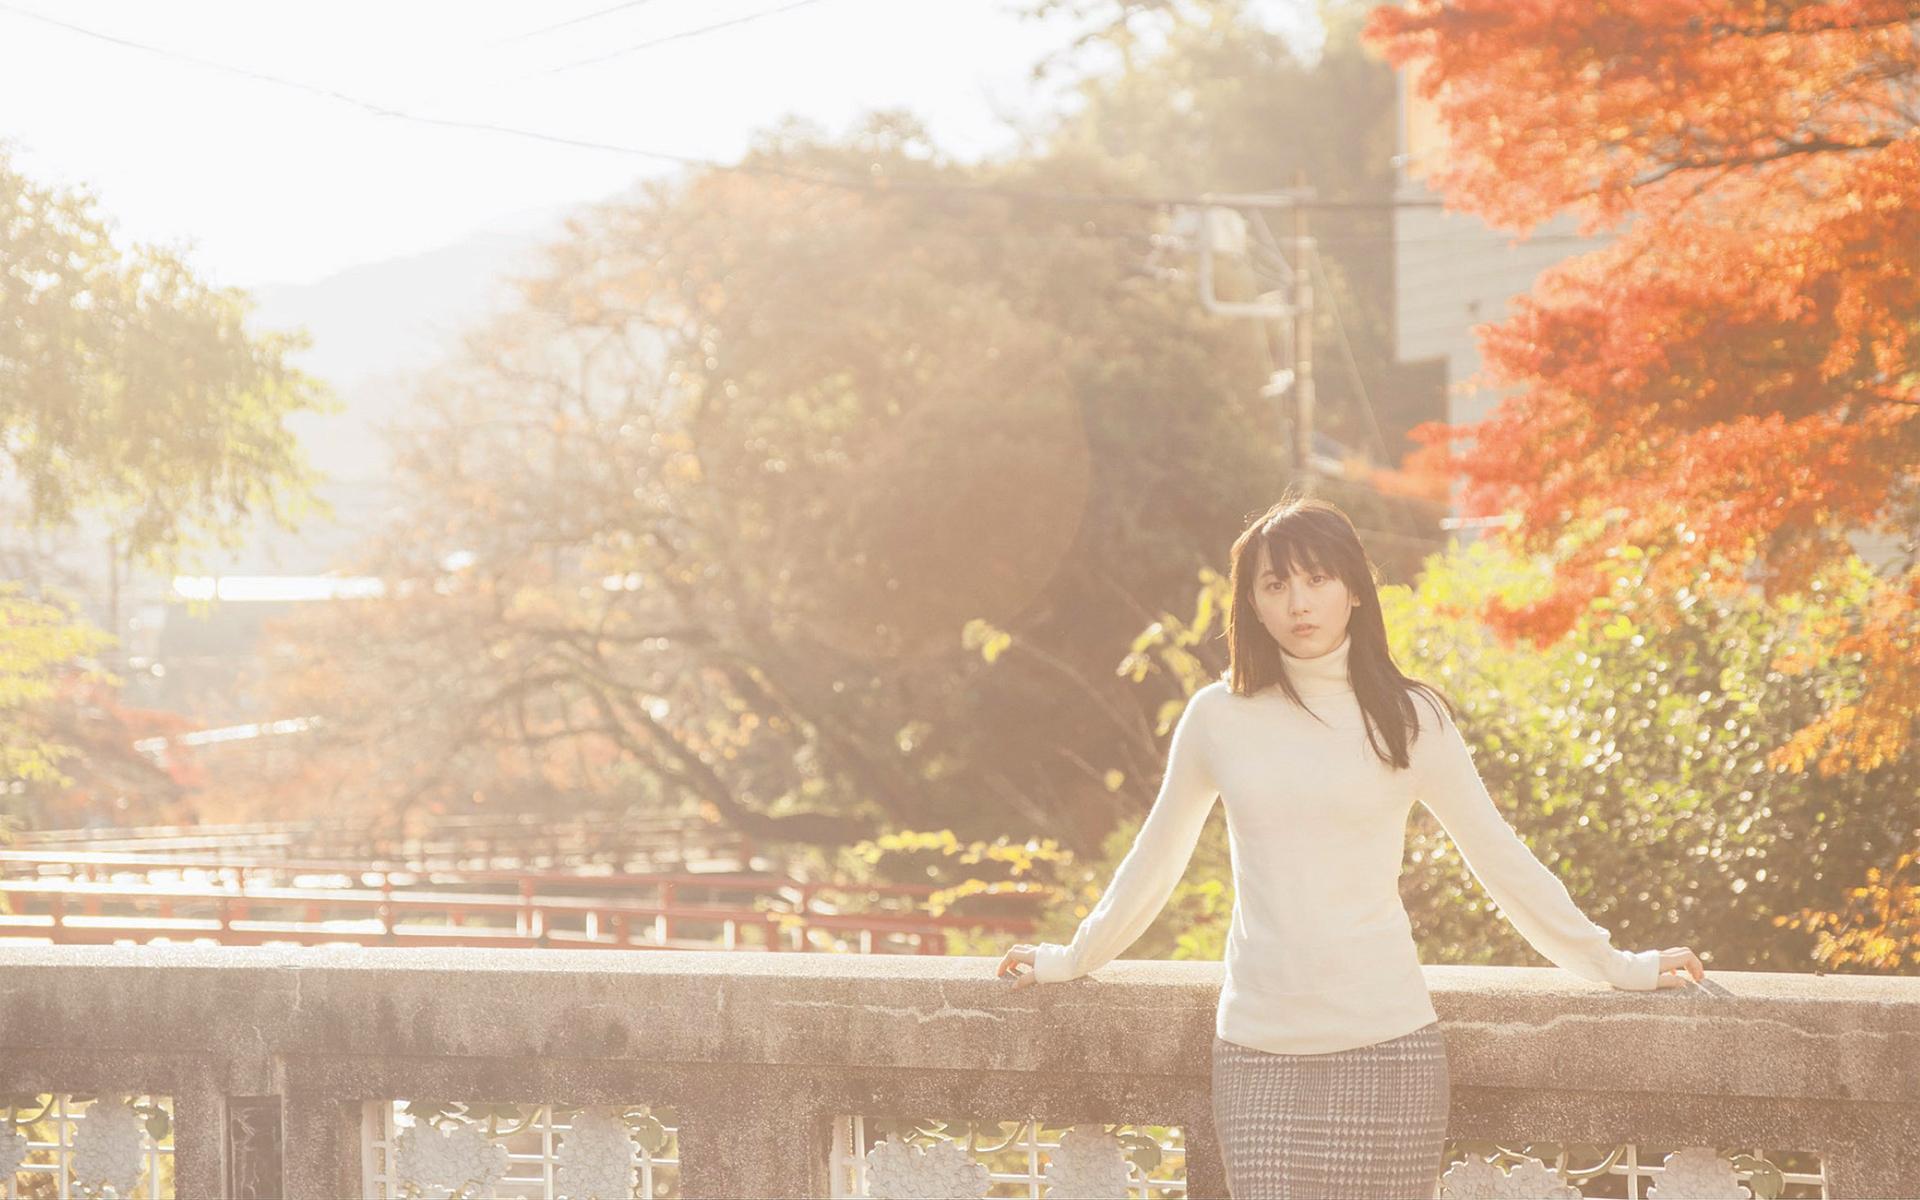 01171920_AKB48_03.jpg